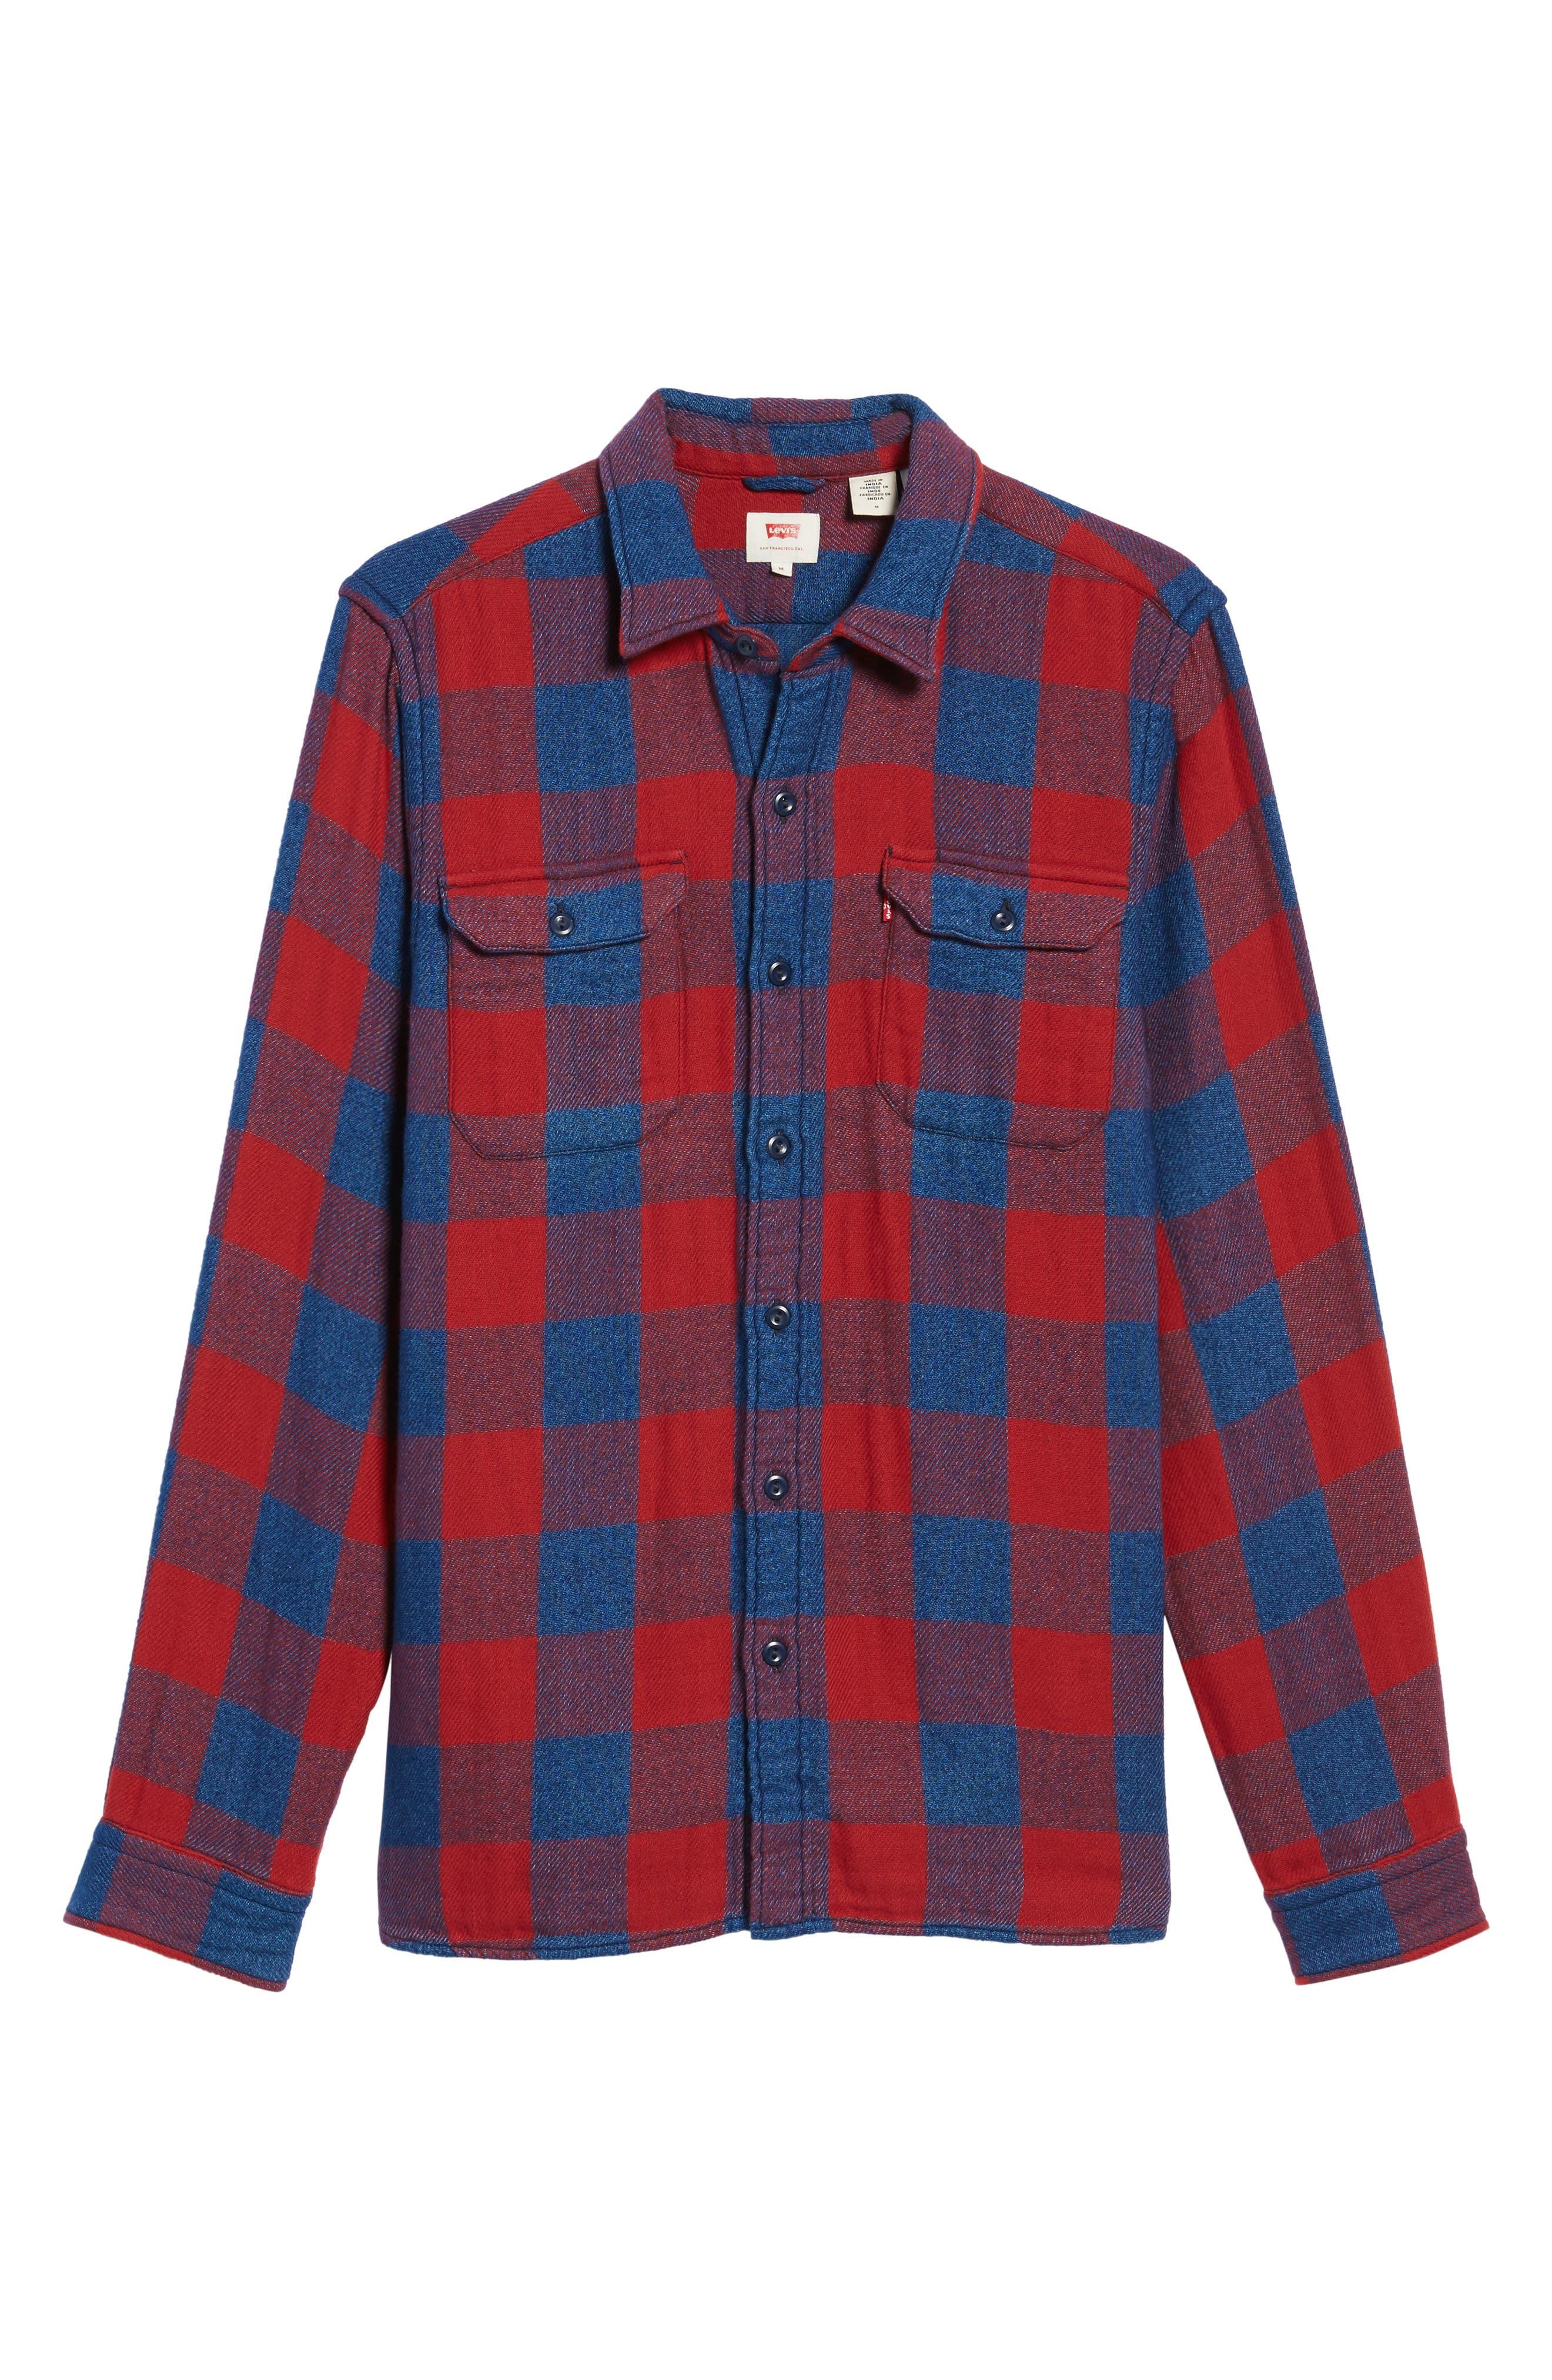 Jackson Worker Shirt,                             Alternate thumbnail 6, color,                             600